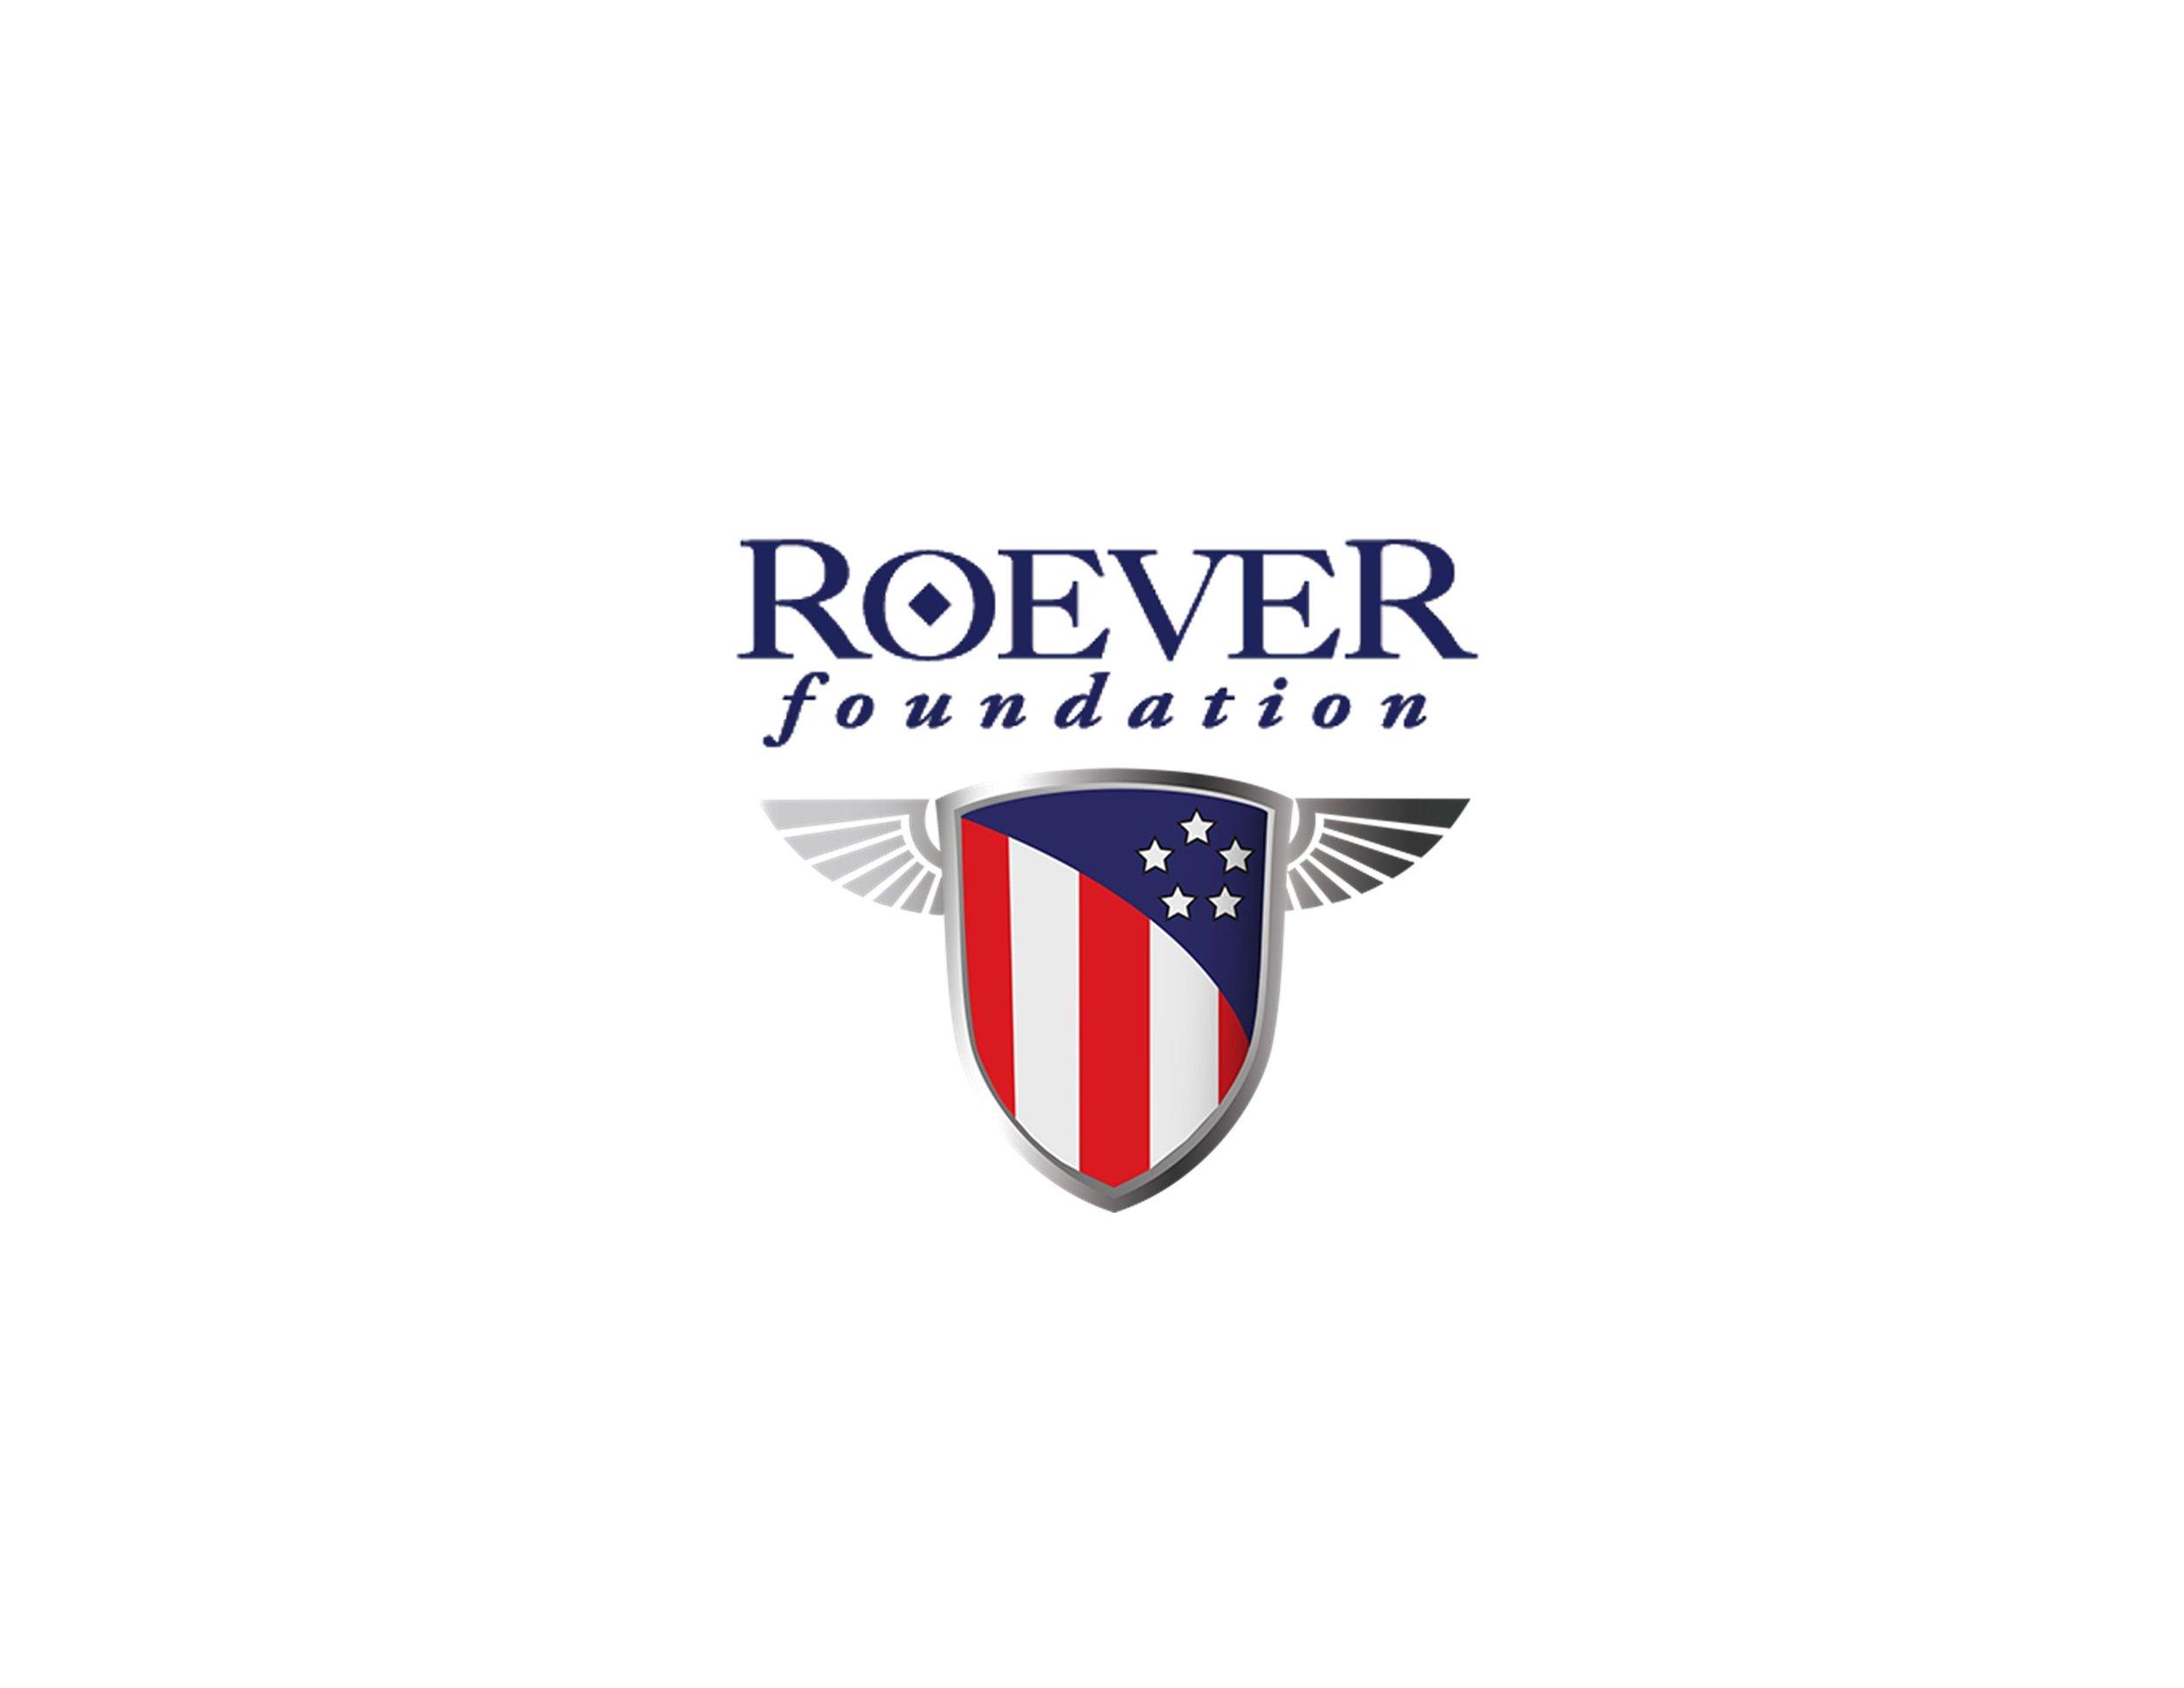 ROEVER FOUNDATION